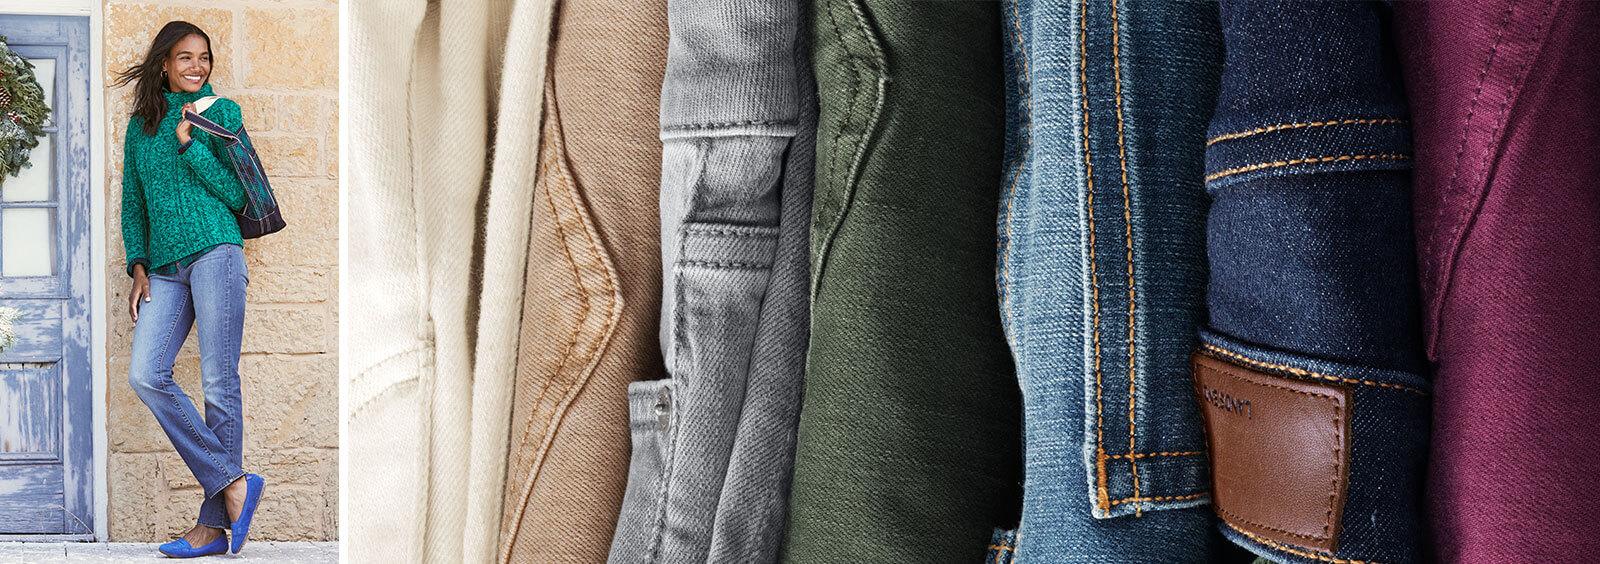 How to Make Jeans More Formal   Lands' End